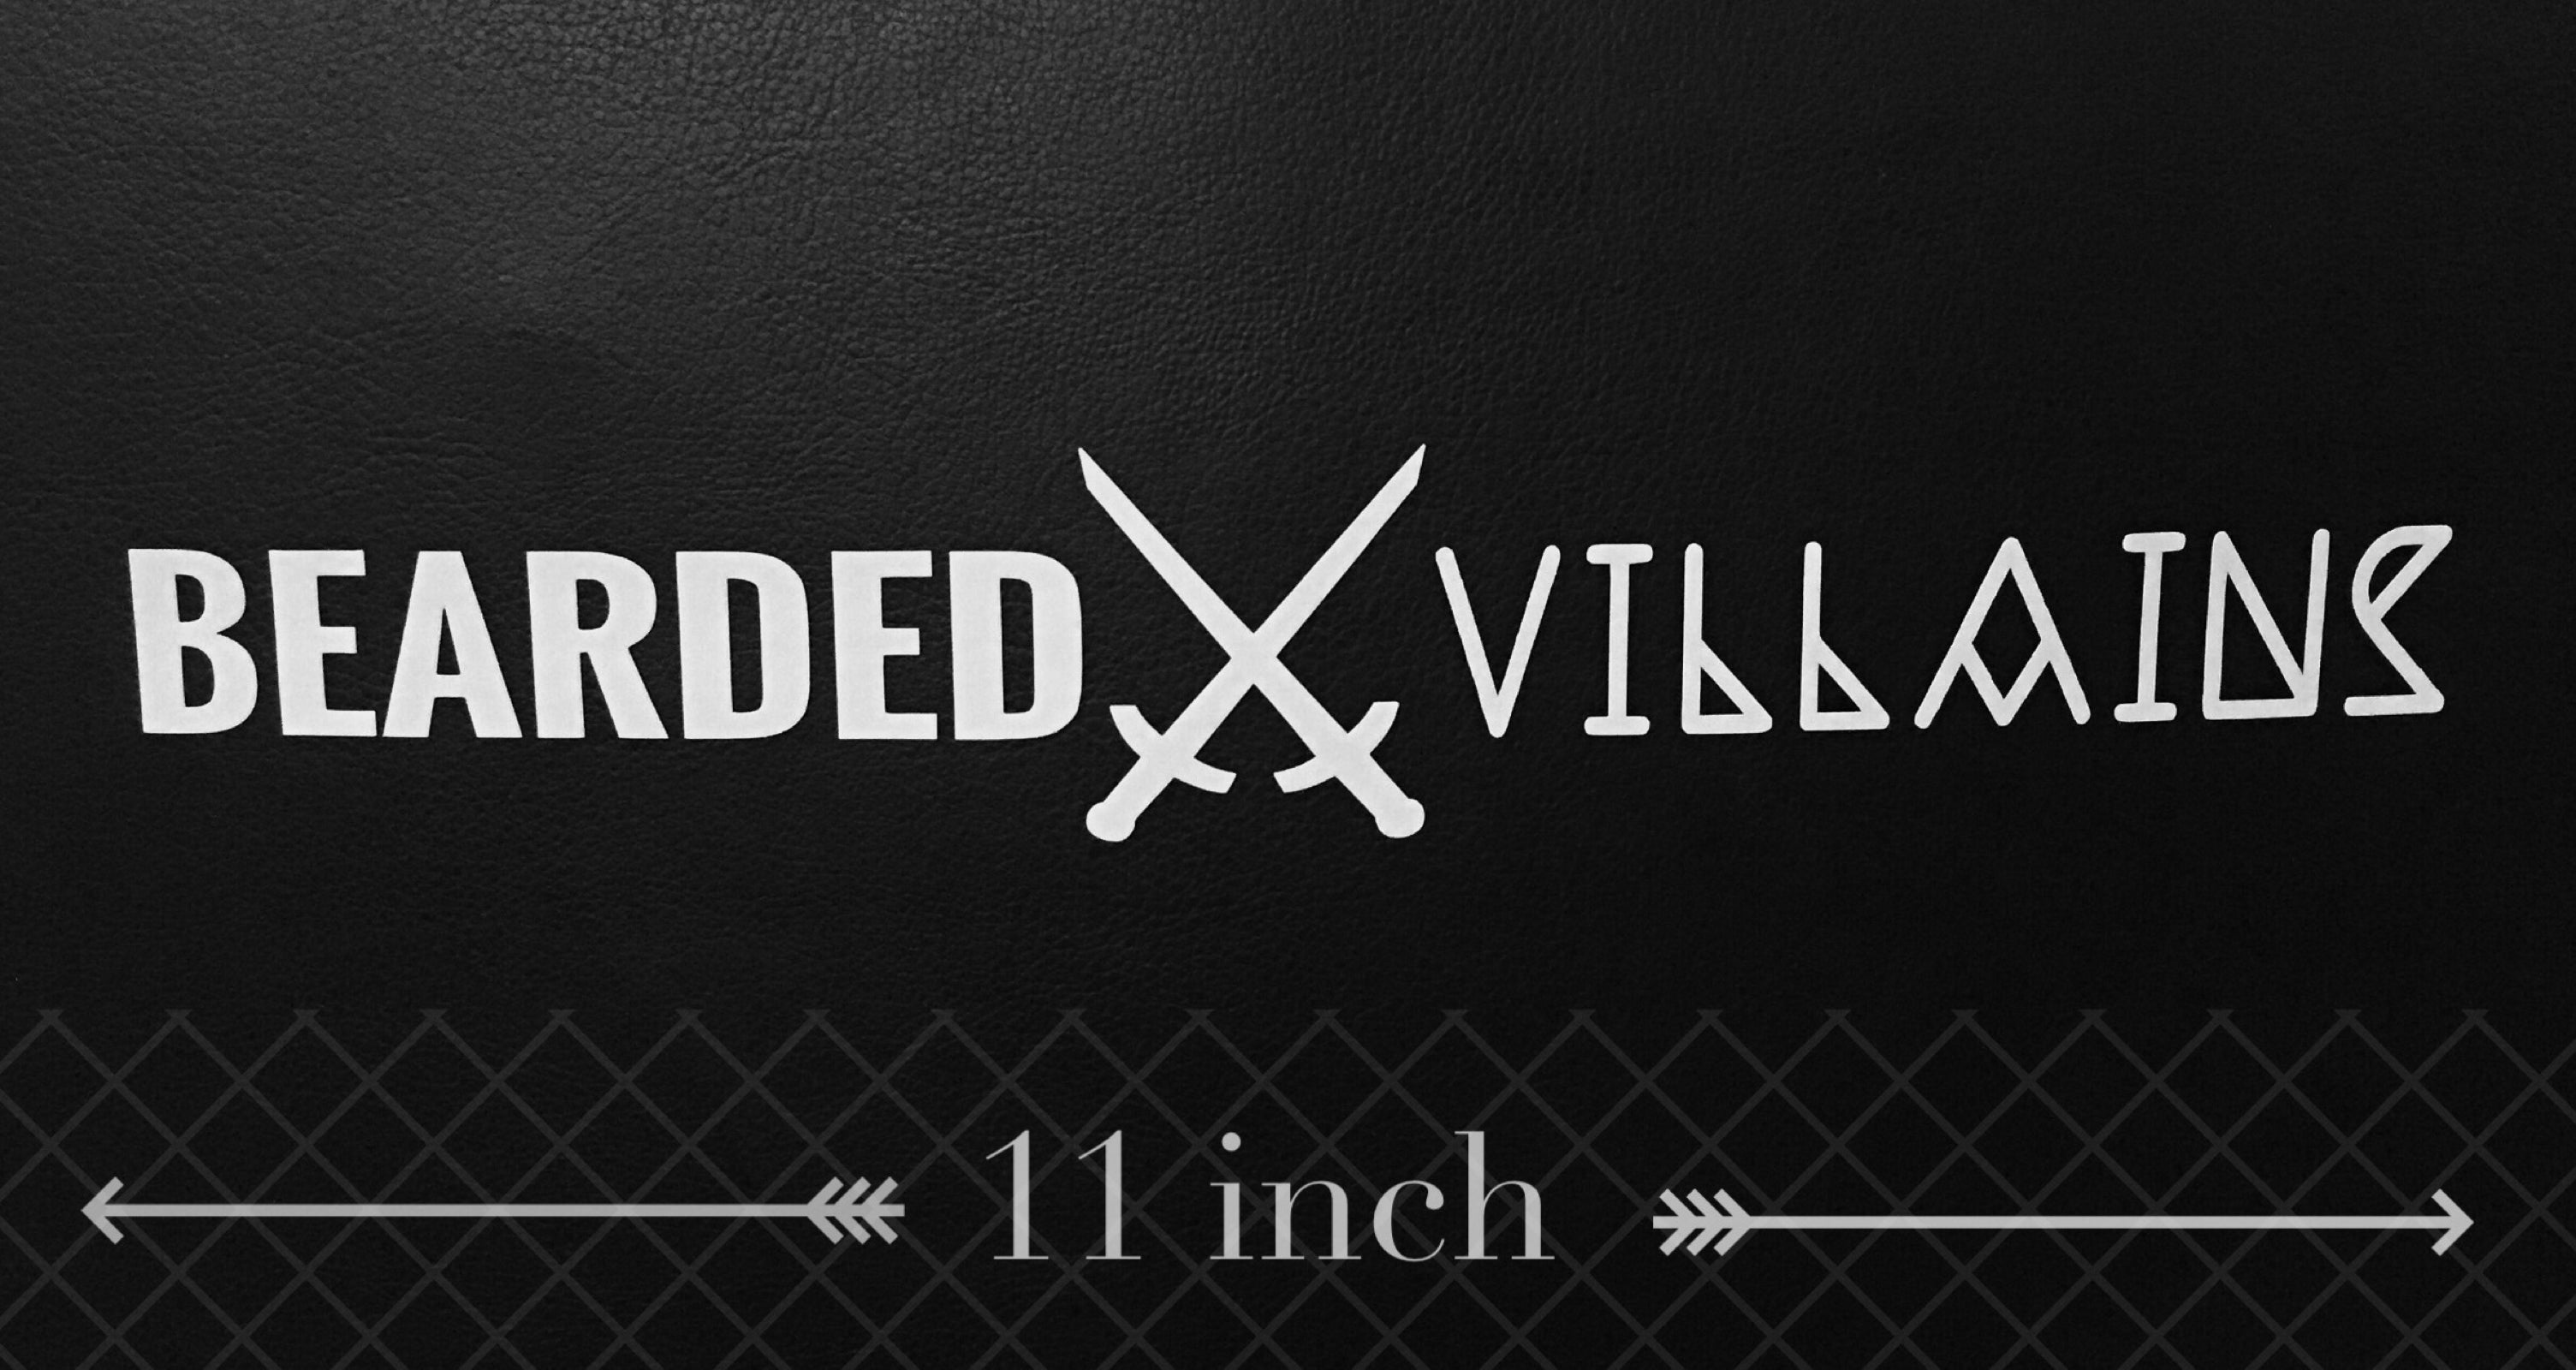 BEARDED⚔VILLAINS Logo Sticker / BEARDED VILLAINS